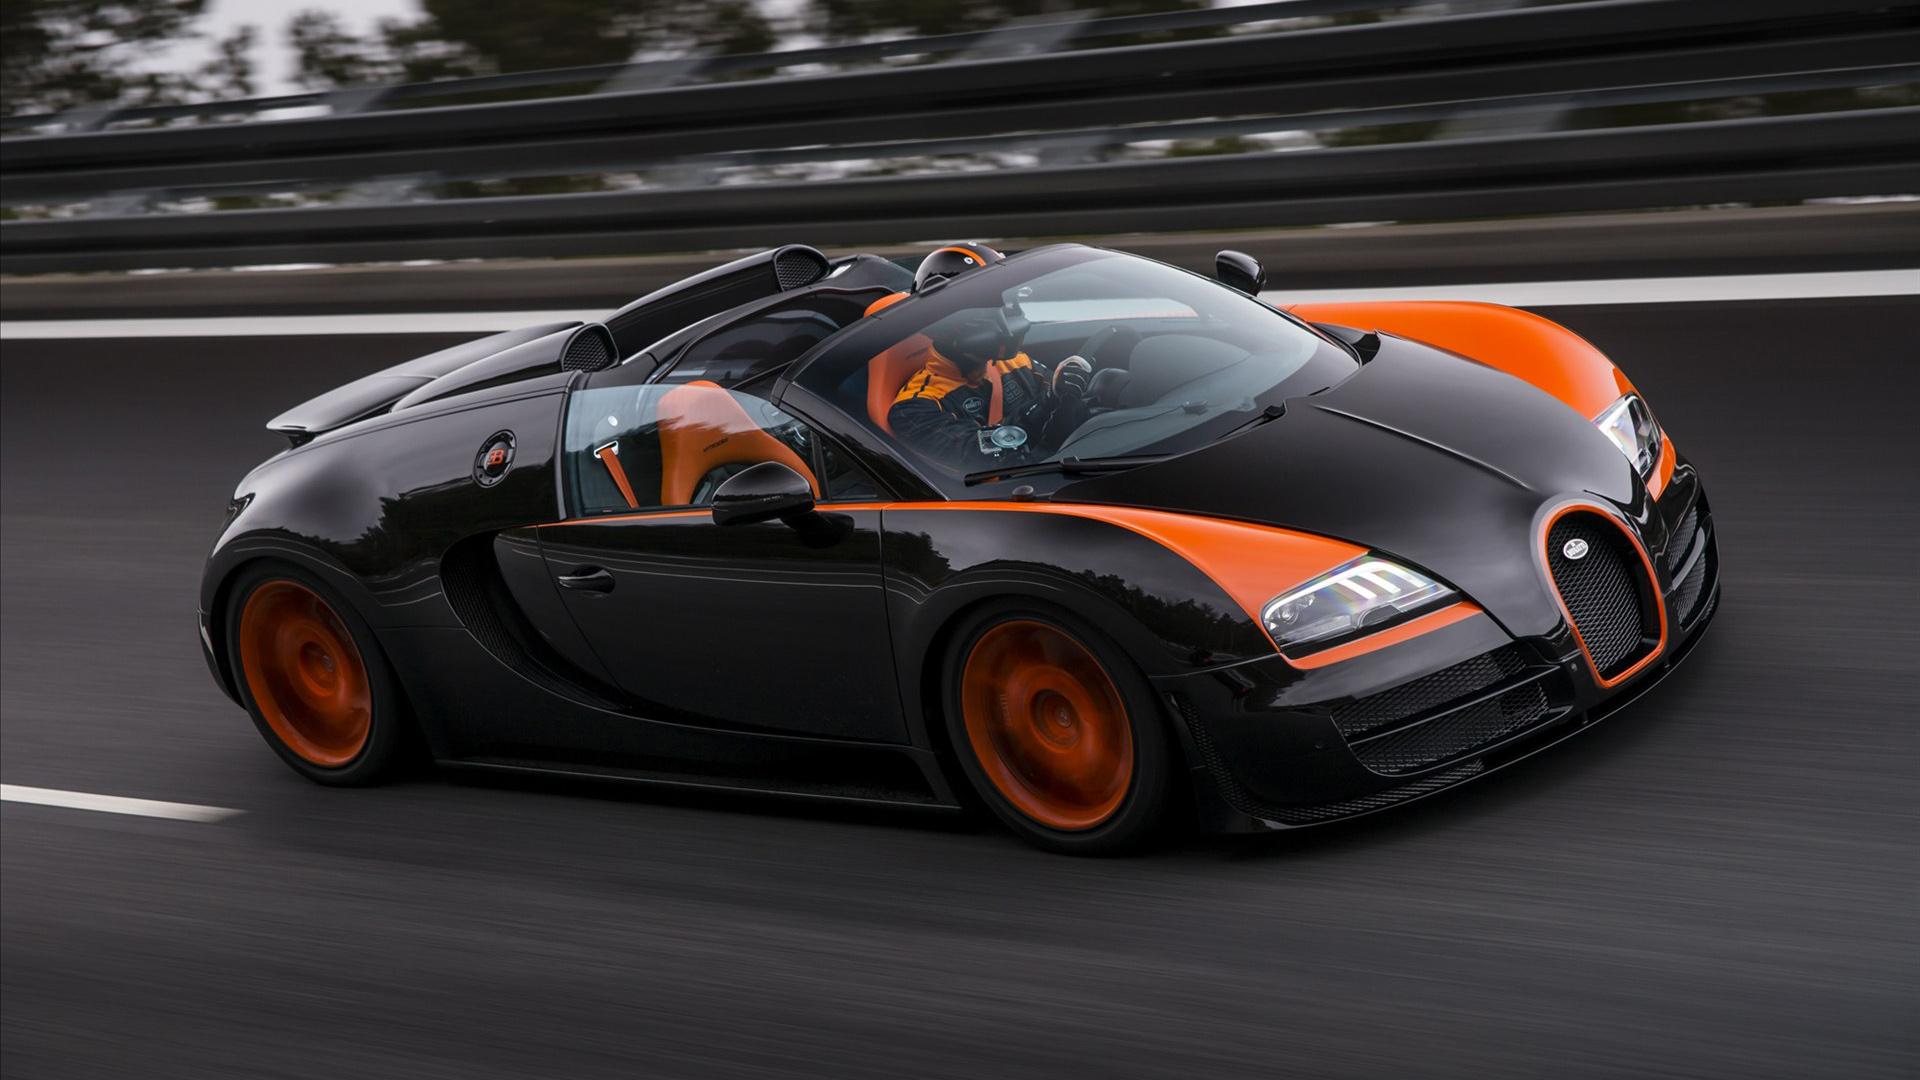 bugatti veyron grand sport vitesse 3 wallpaper hd car. Black Bedroom Furniture Sets. Home Design Ideas